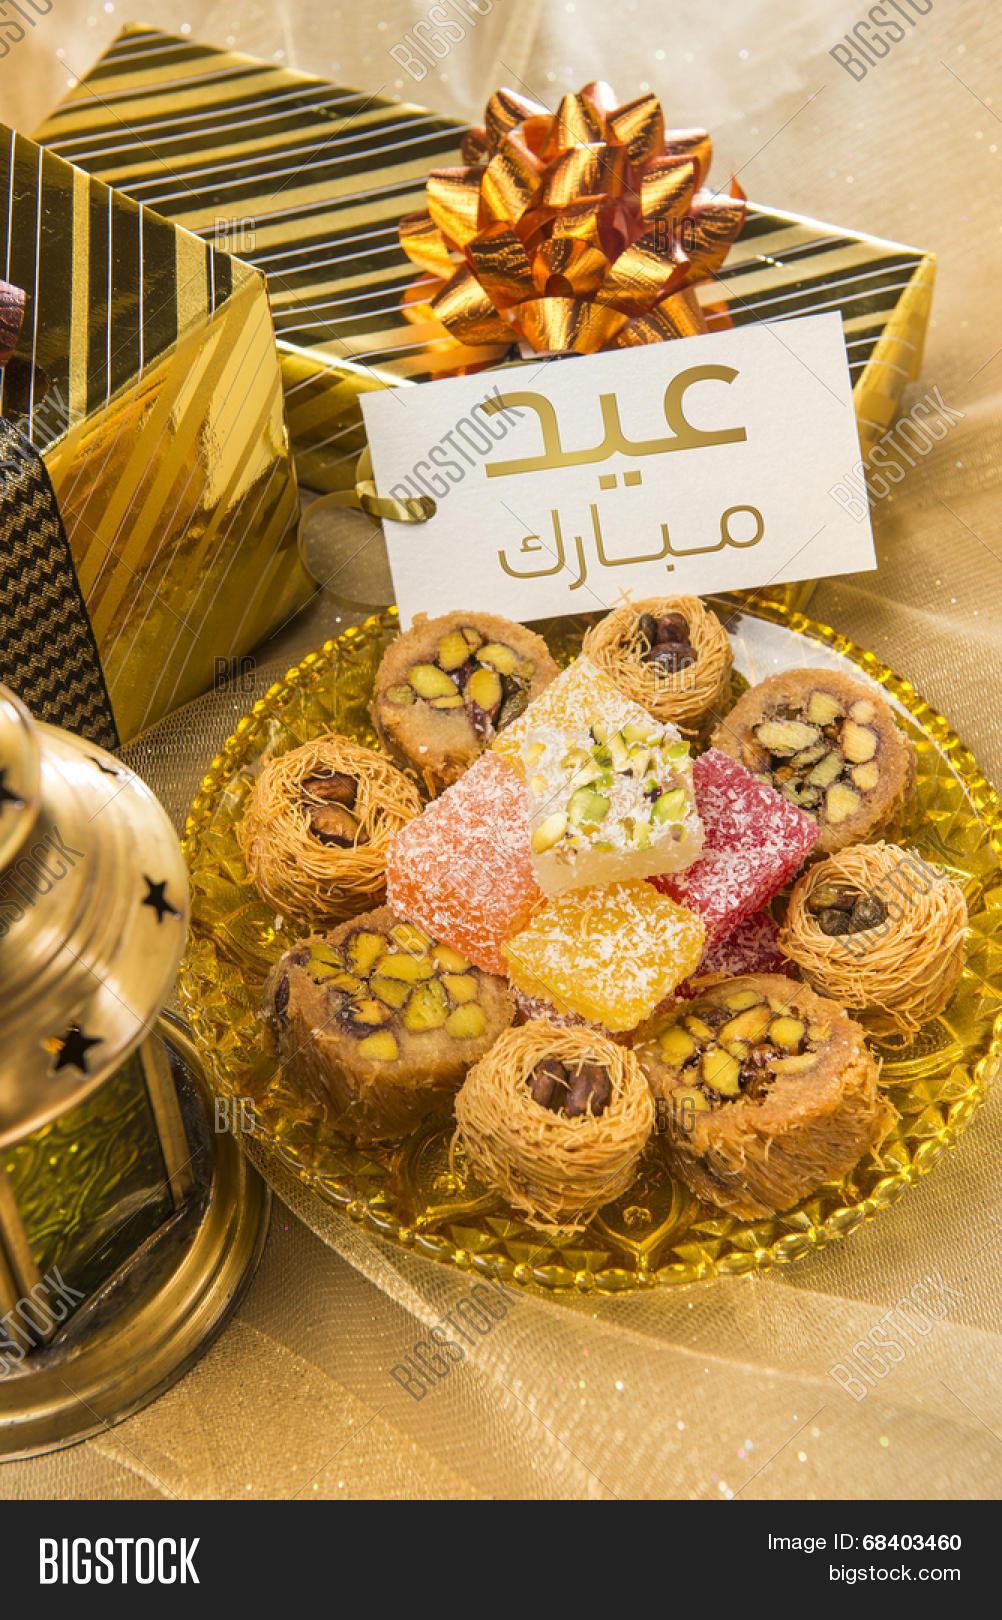 Eid Mubarak Message Image Photo Free Trial Bigstock